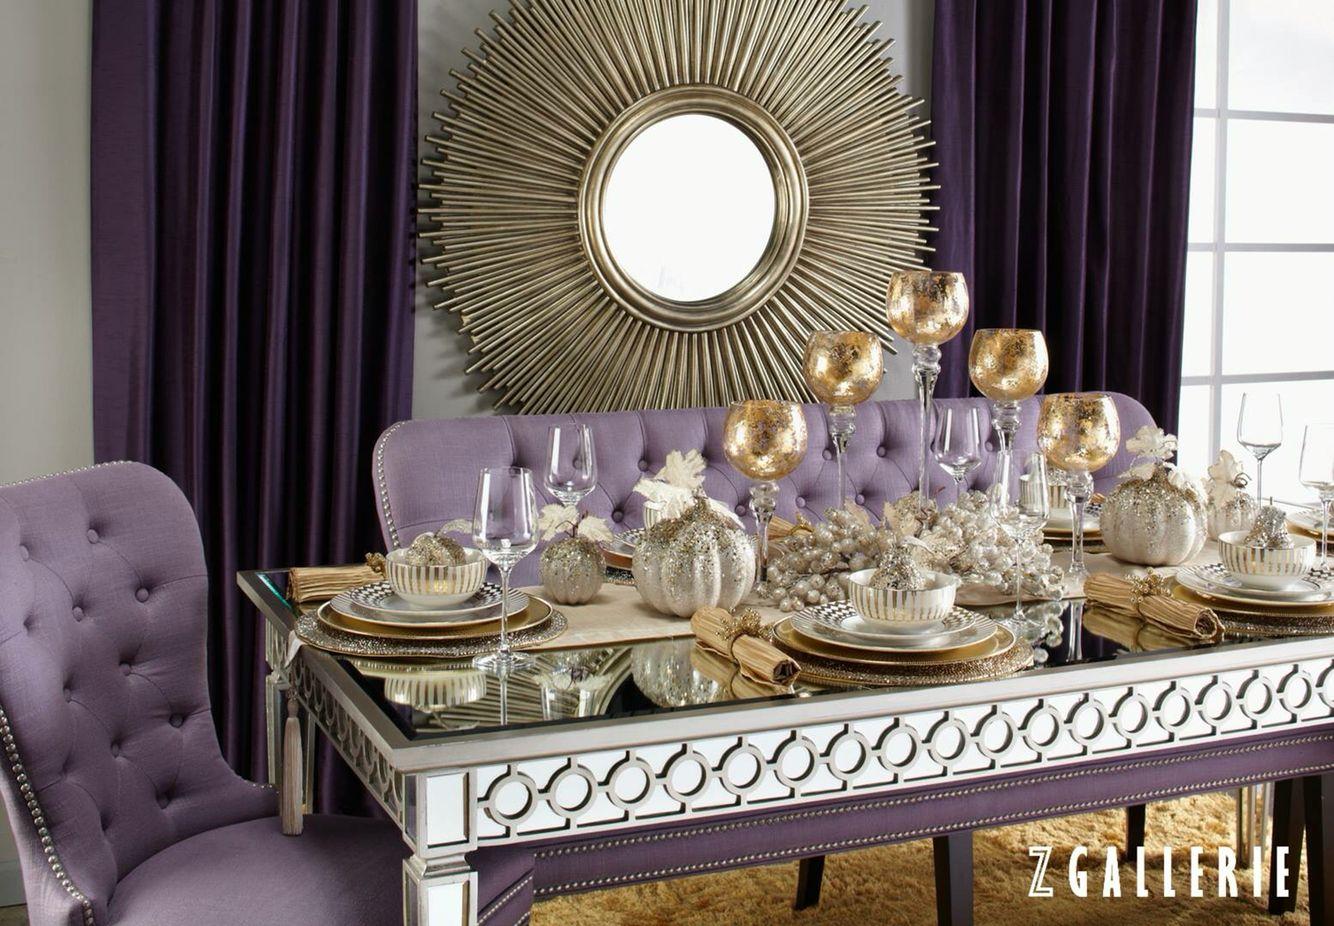 Purple Gold Wildcat Dining Stylish Home Decor Dining Decor Dining Table Decor